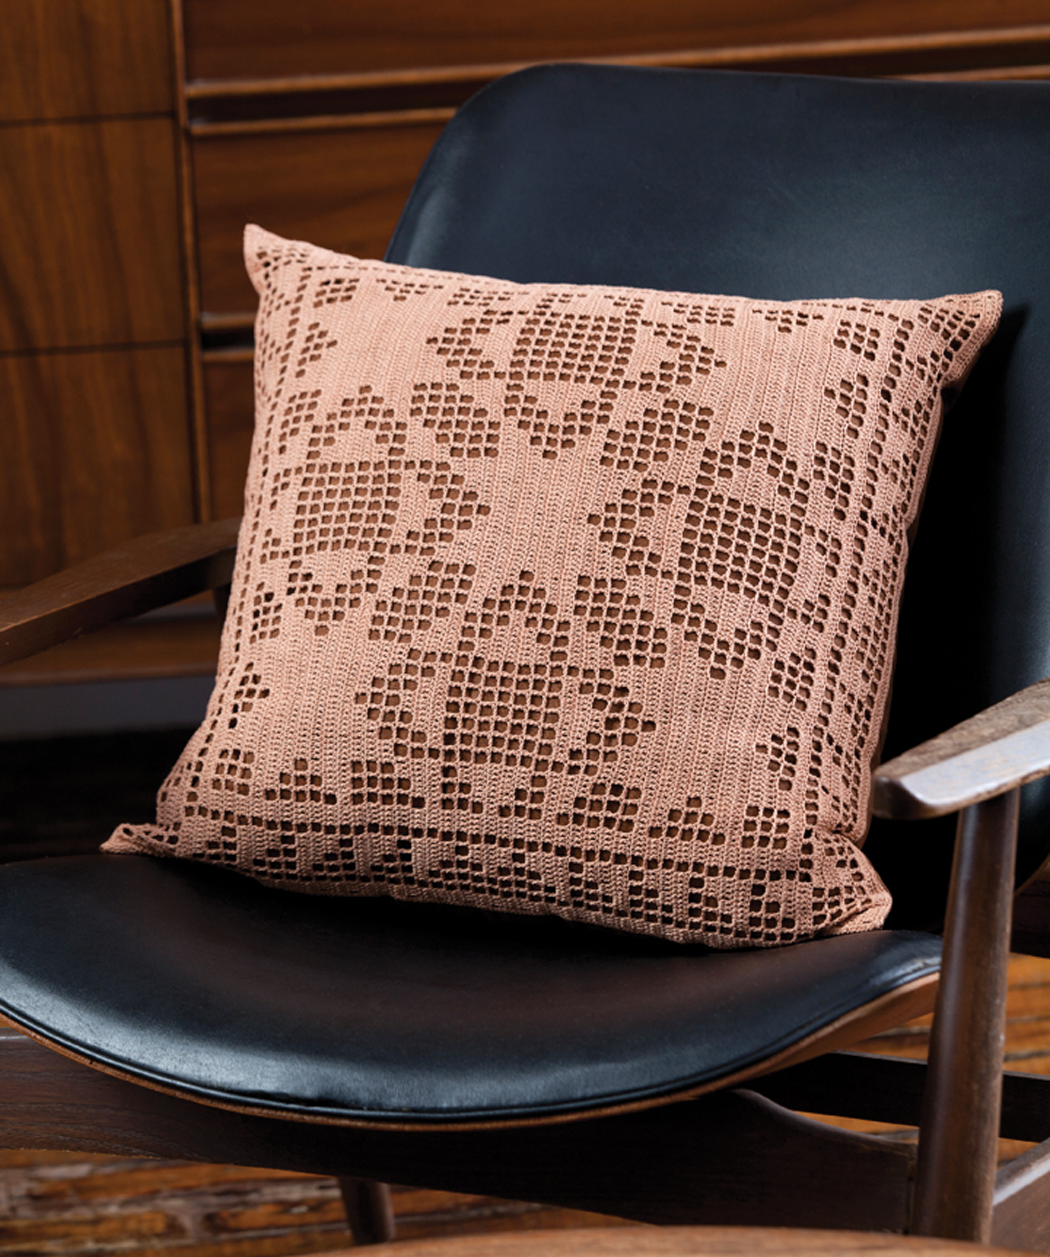 Quilt Block Filet Pillow - free pattern from Red Heart | Crochet ...